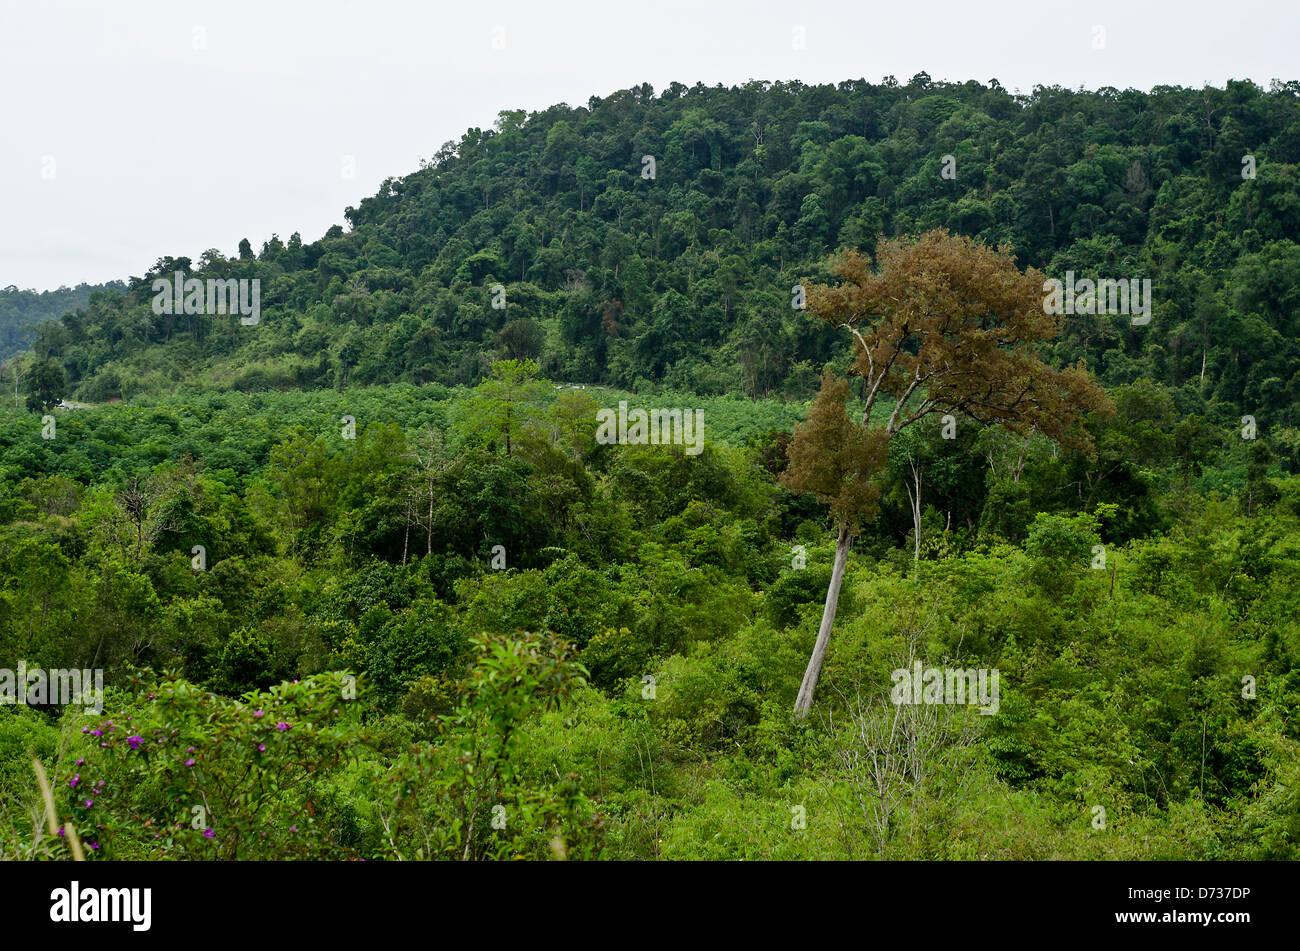 cardamom mountains, chi phat stock photo: 56005426 - alamy